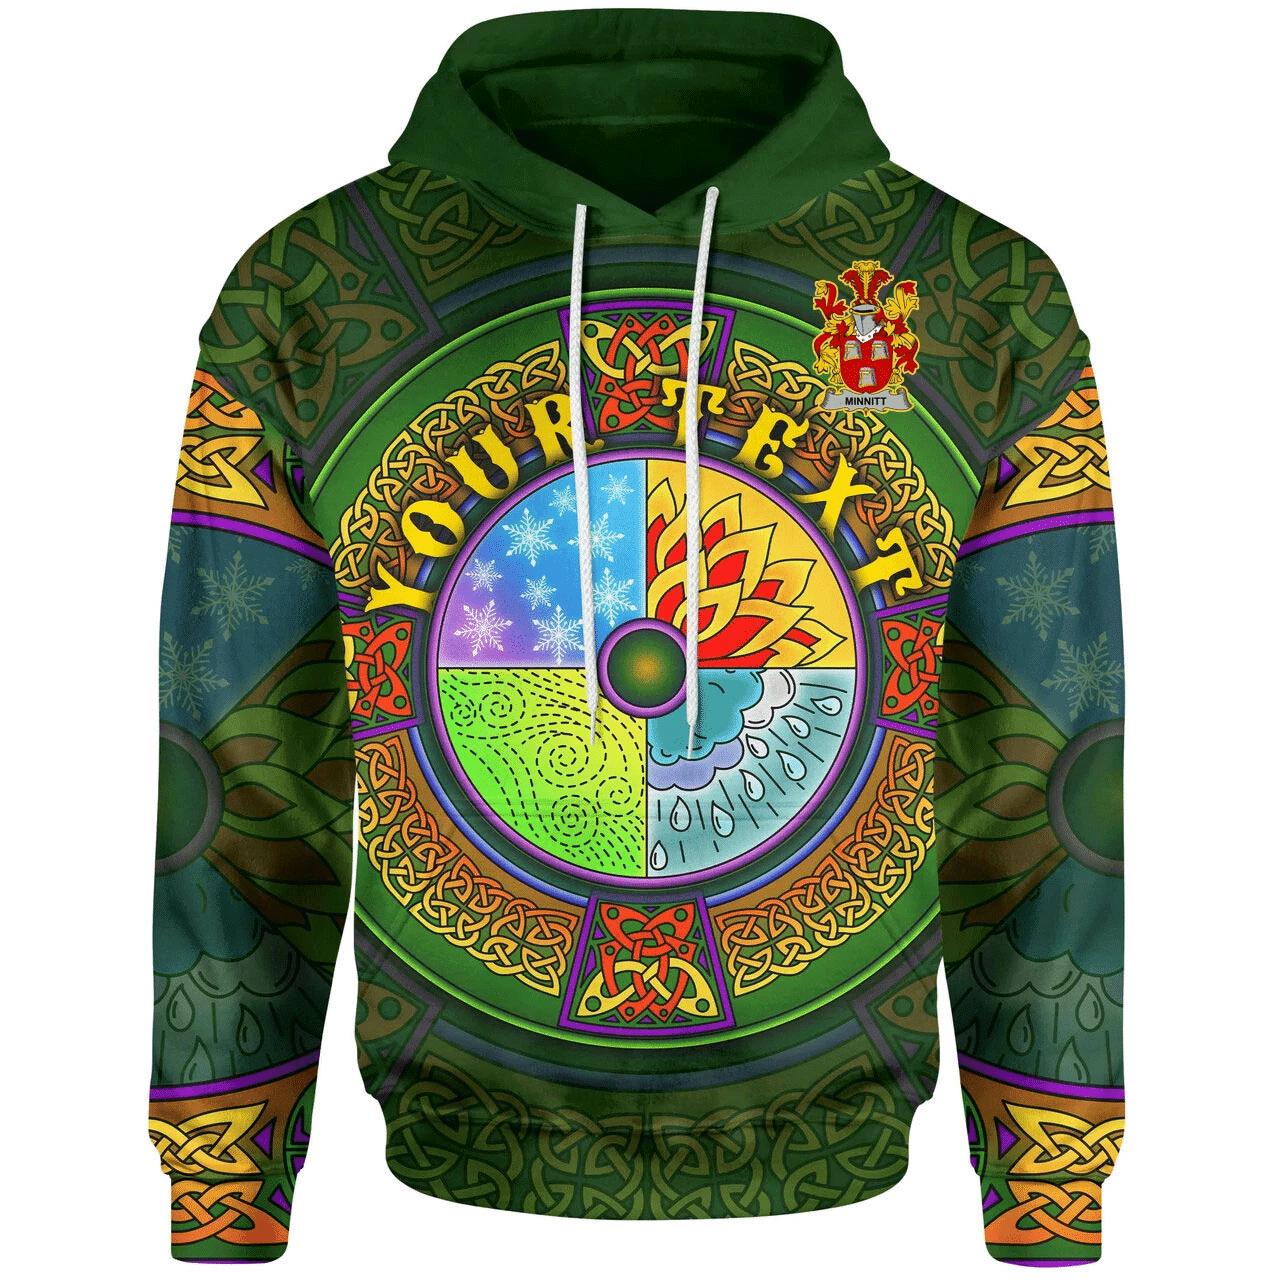 (Custom) 1stIreland Ireland Hoodie - Minnitt Irish Family Crest Hoodie - Celtic Element A7